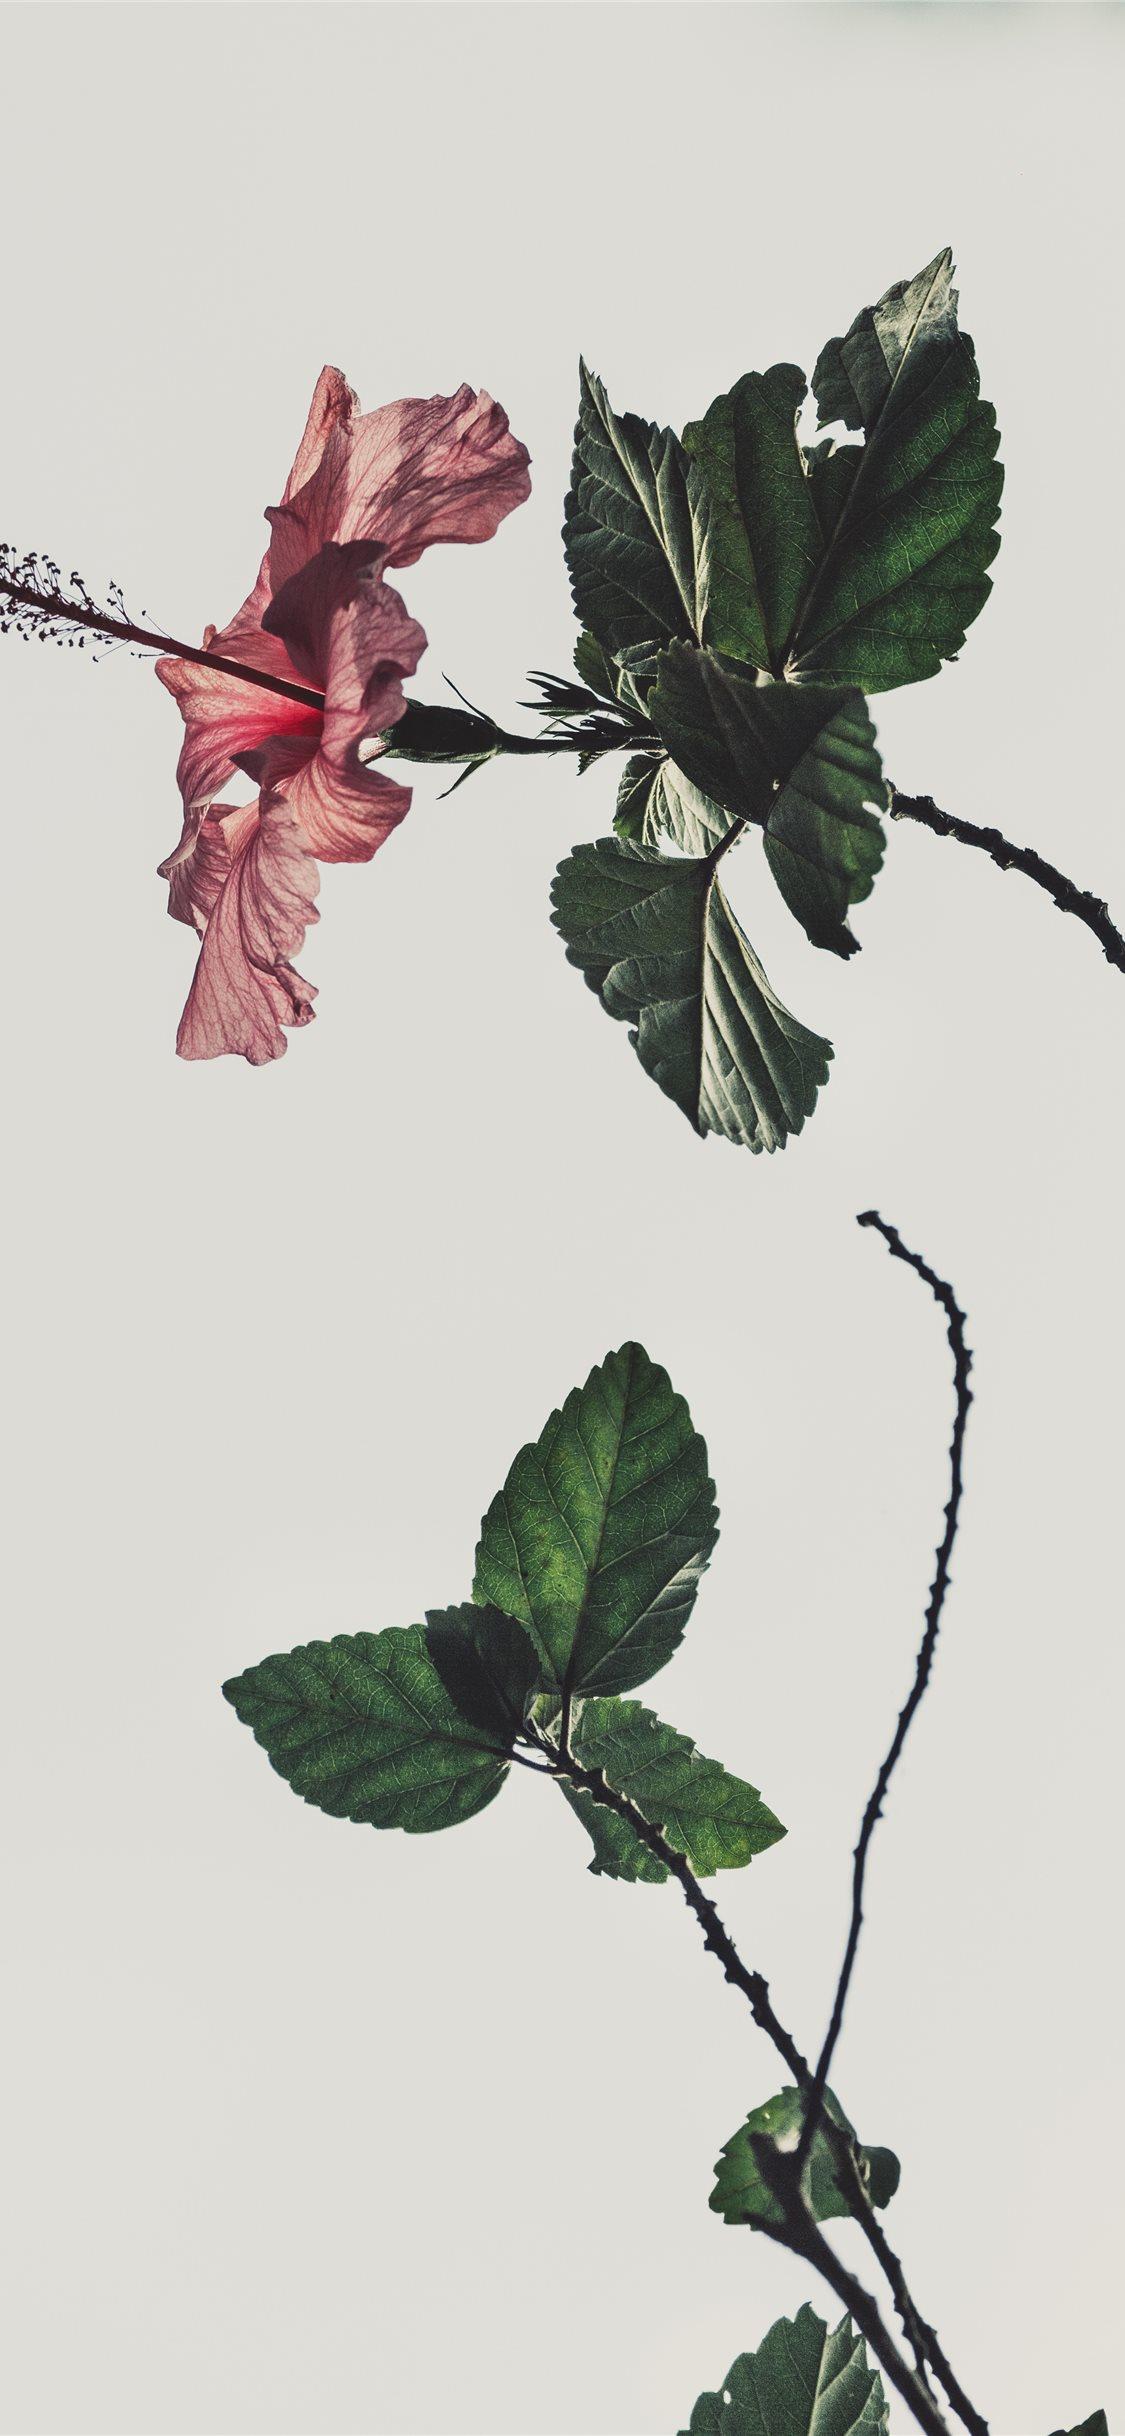 Best Roses Iphone X Wallpapers Hd Ilikewallpaper